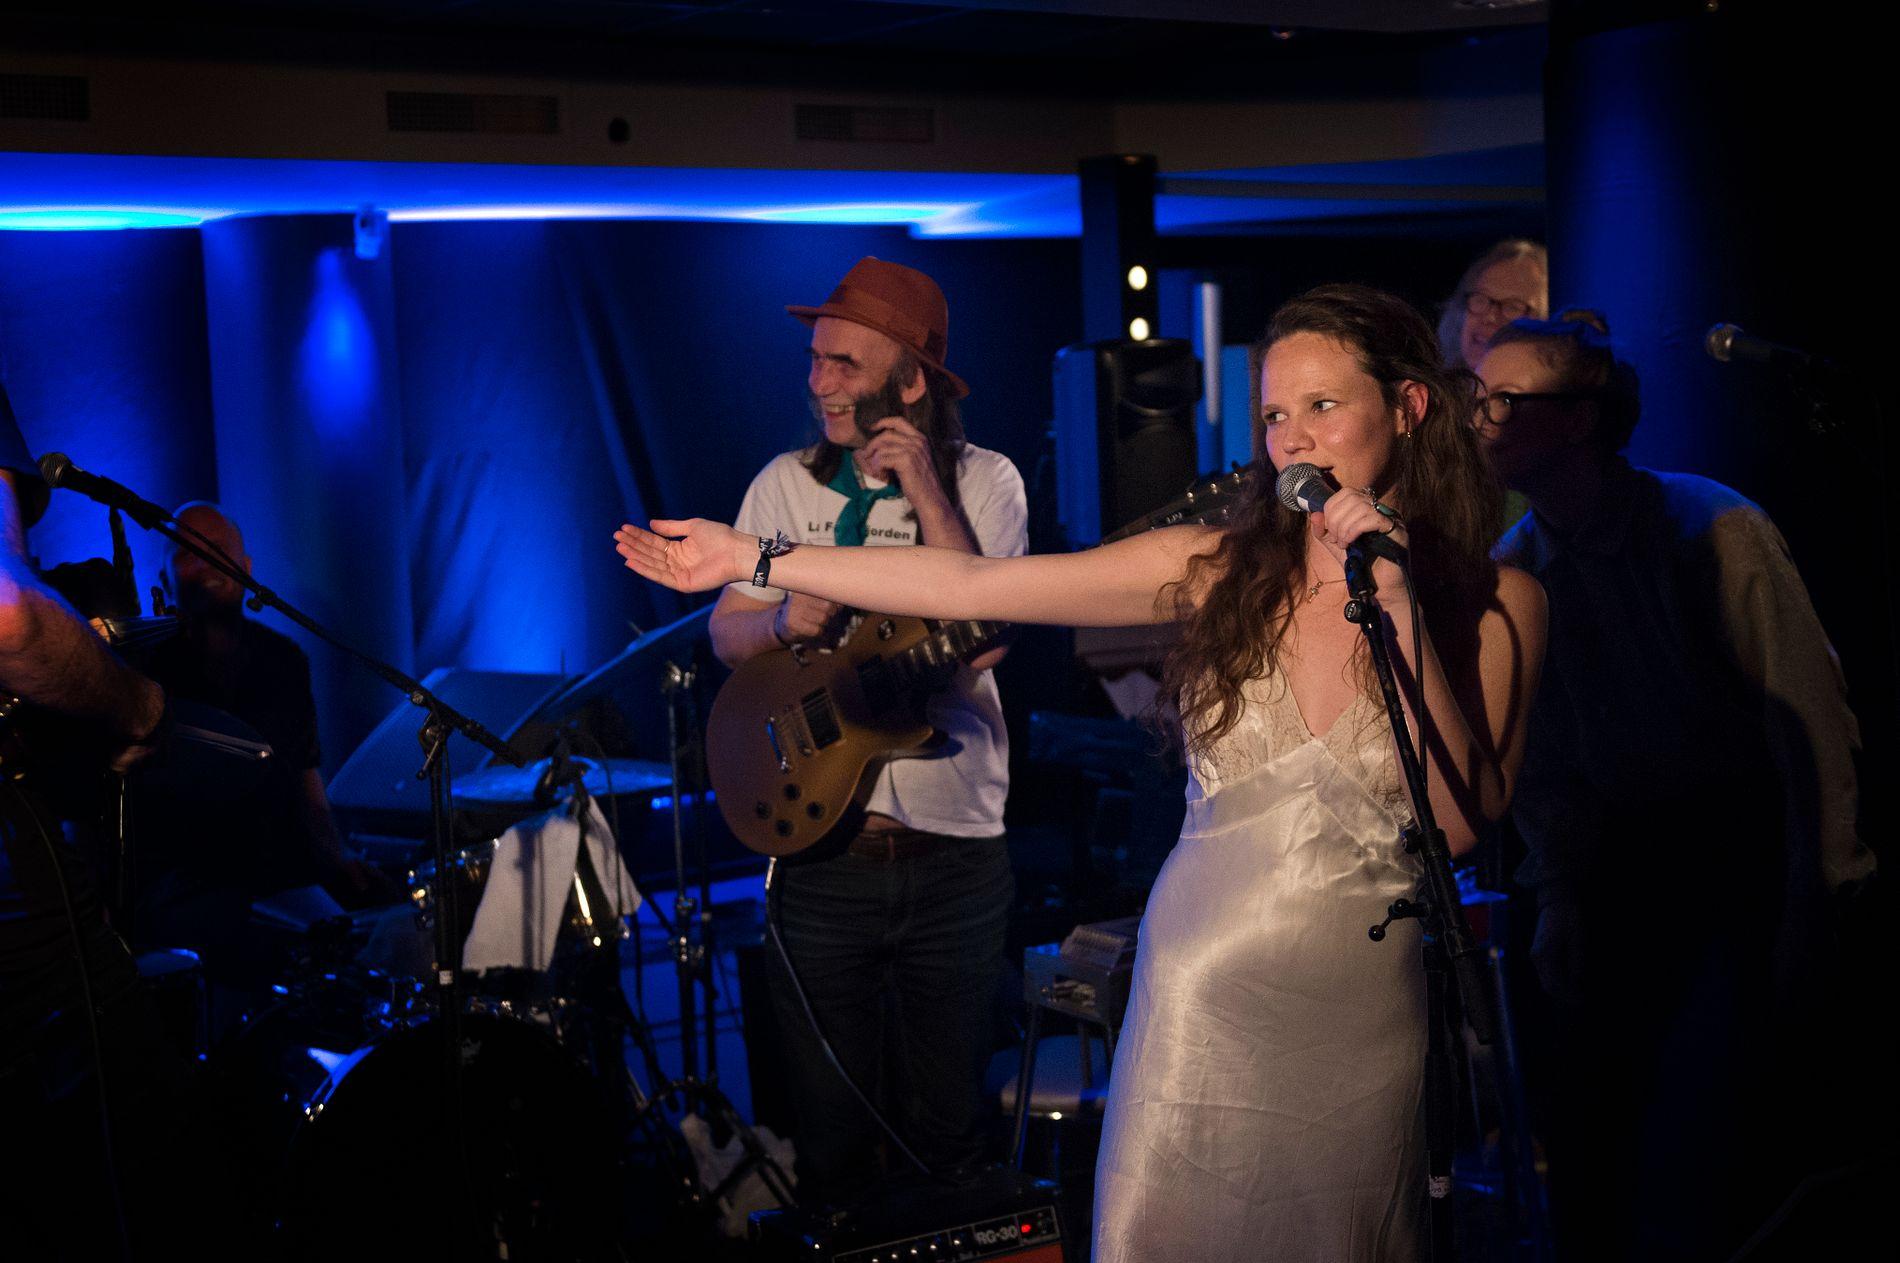 I STORSLAG: Maesa Pullman og The Last Hurrah! deltok på americanafestivalen i Bergen. Her fra Vossajazz i 2017.